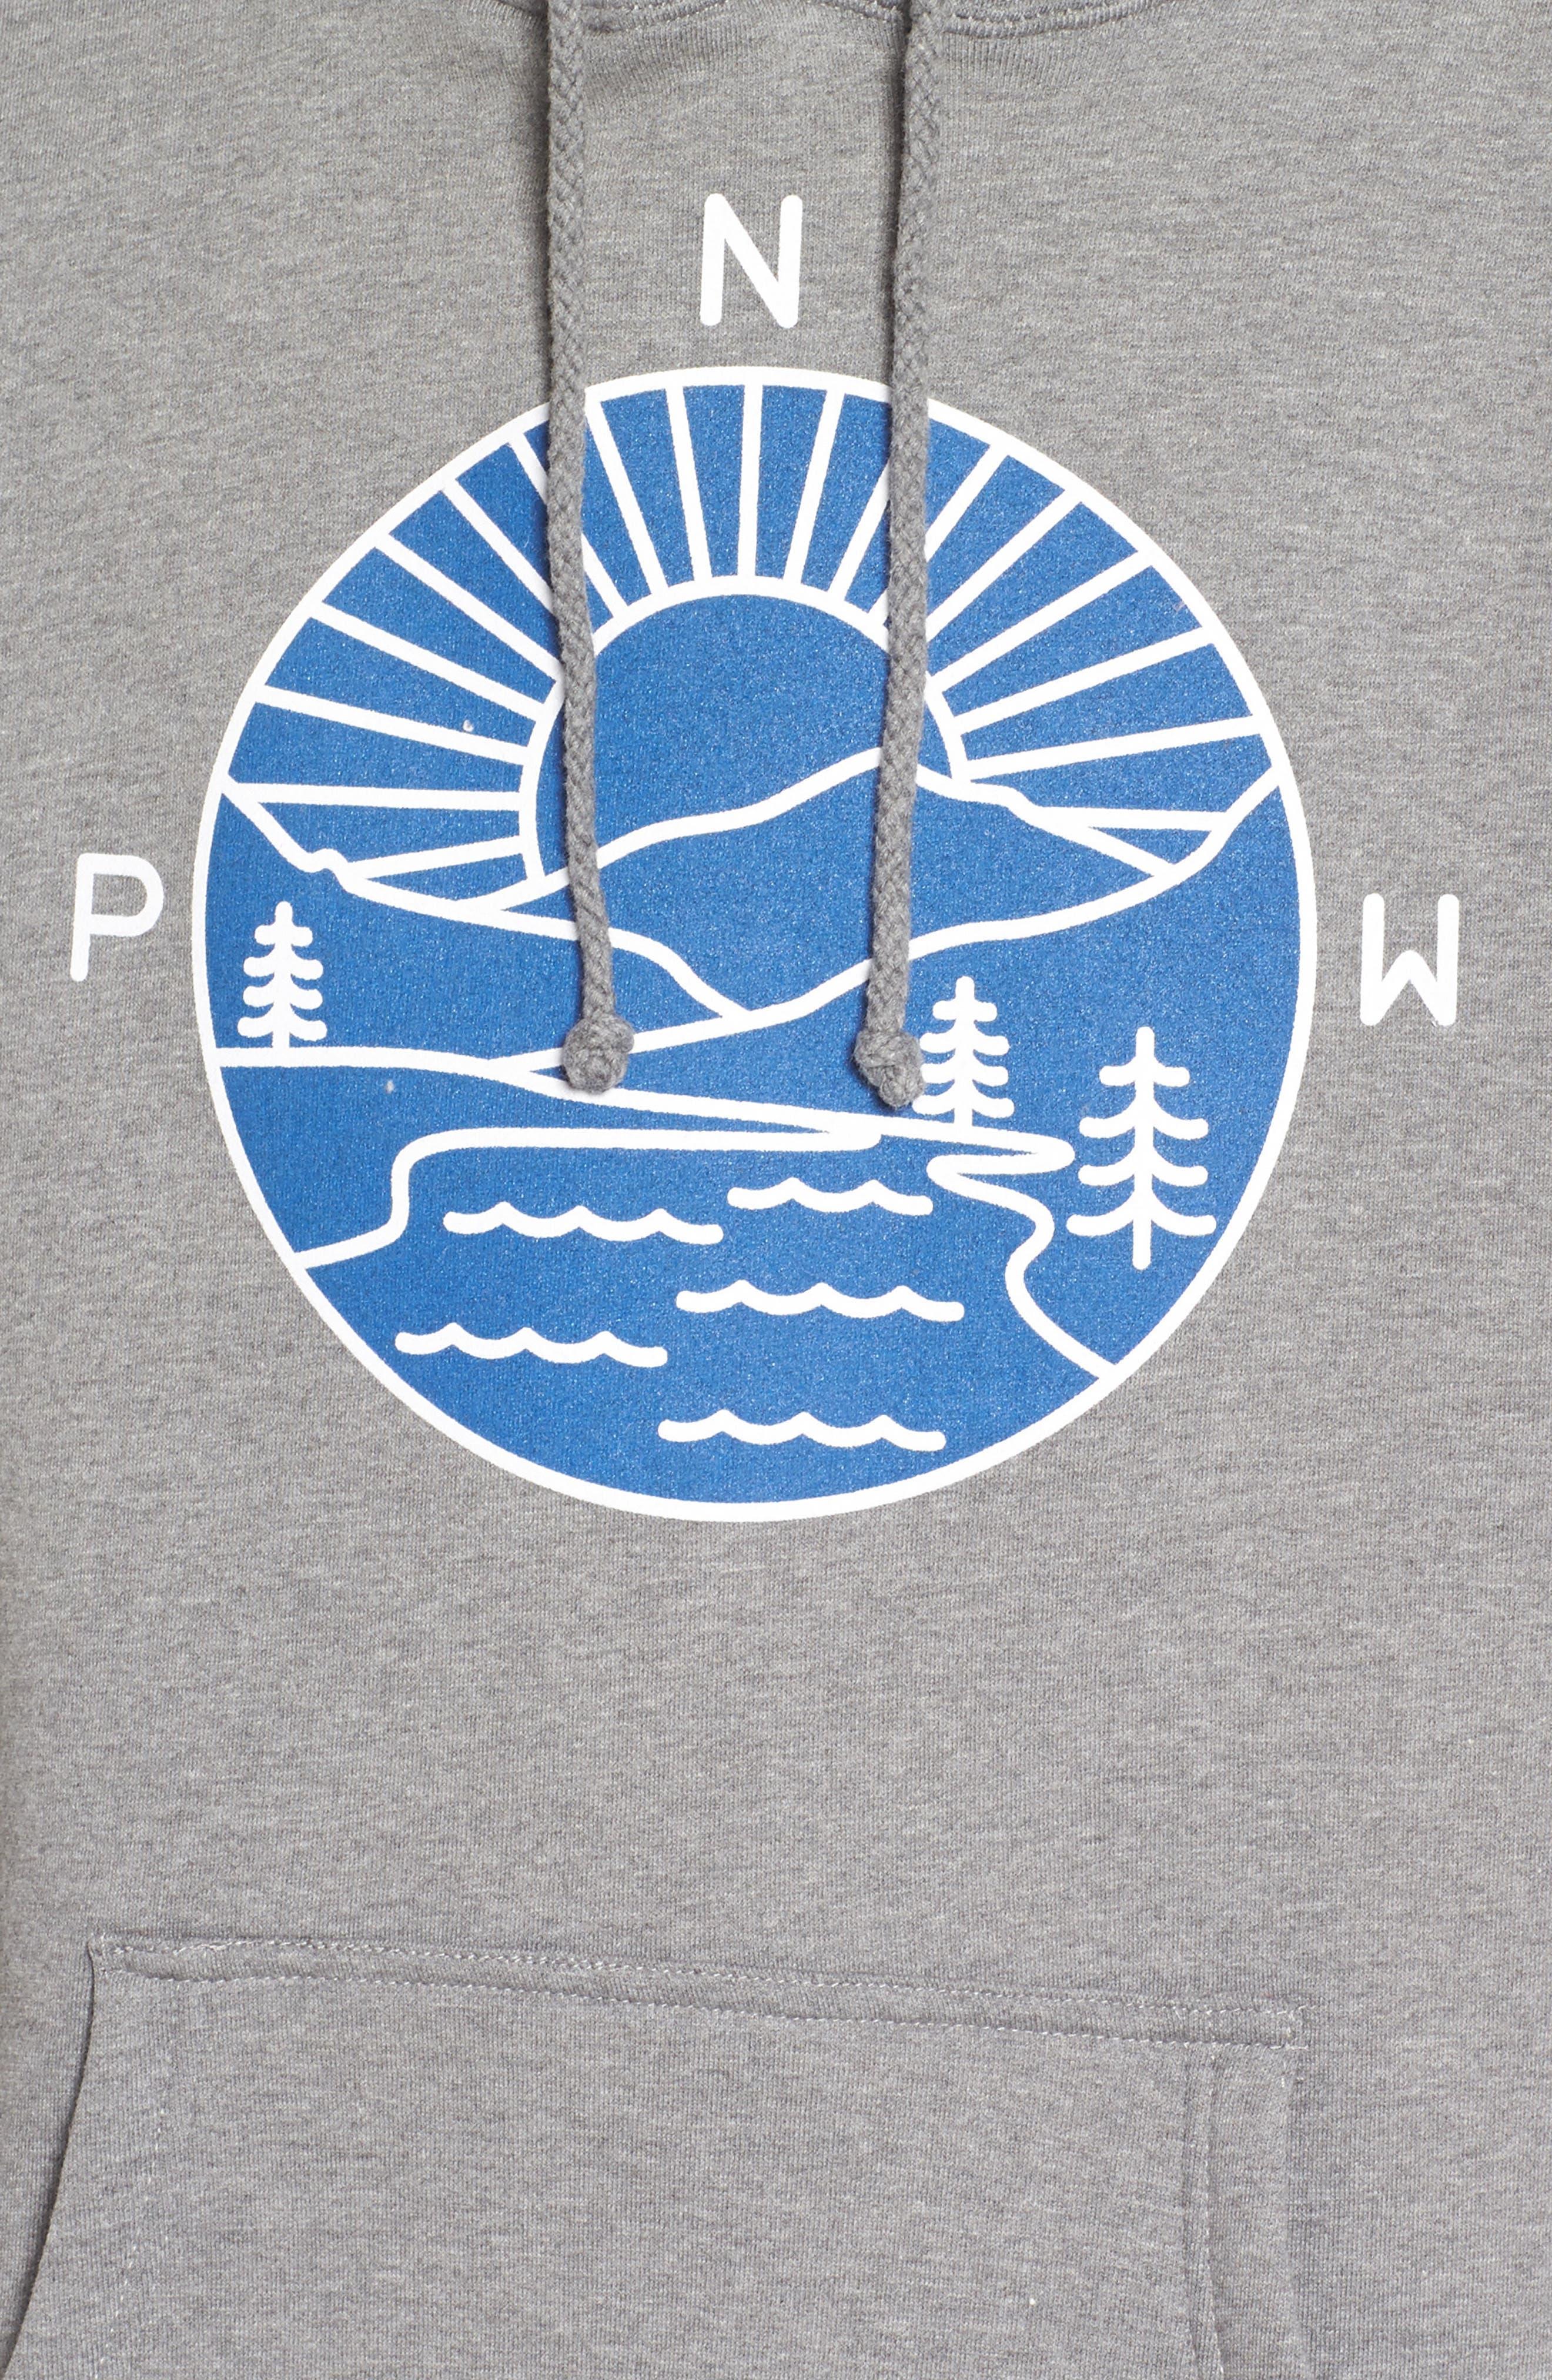 PNW Explorer Hoodie,                             Alternate thumbnail 5, color,                             Heather Gun Metal